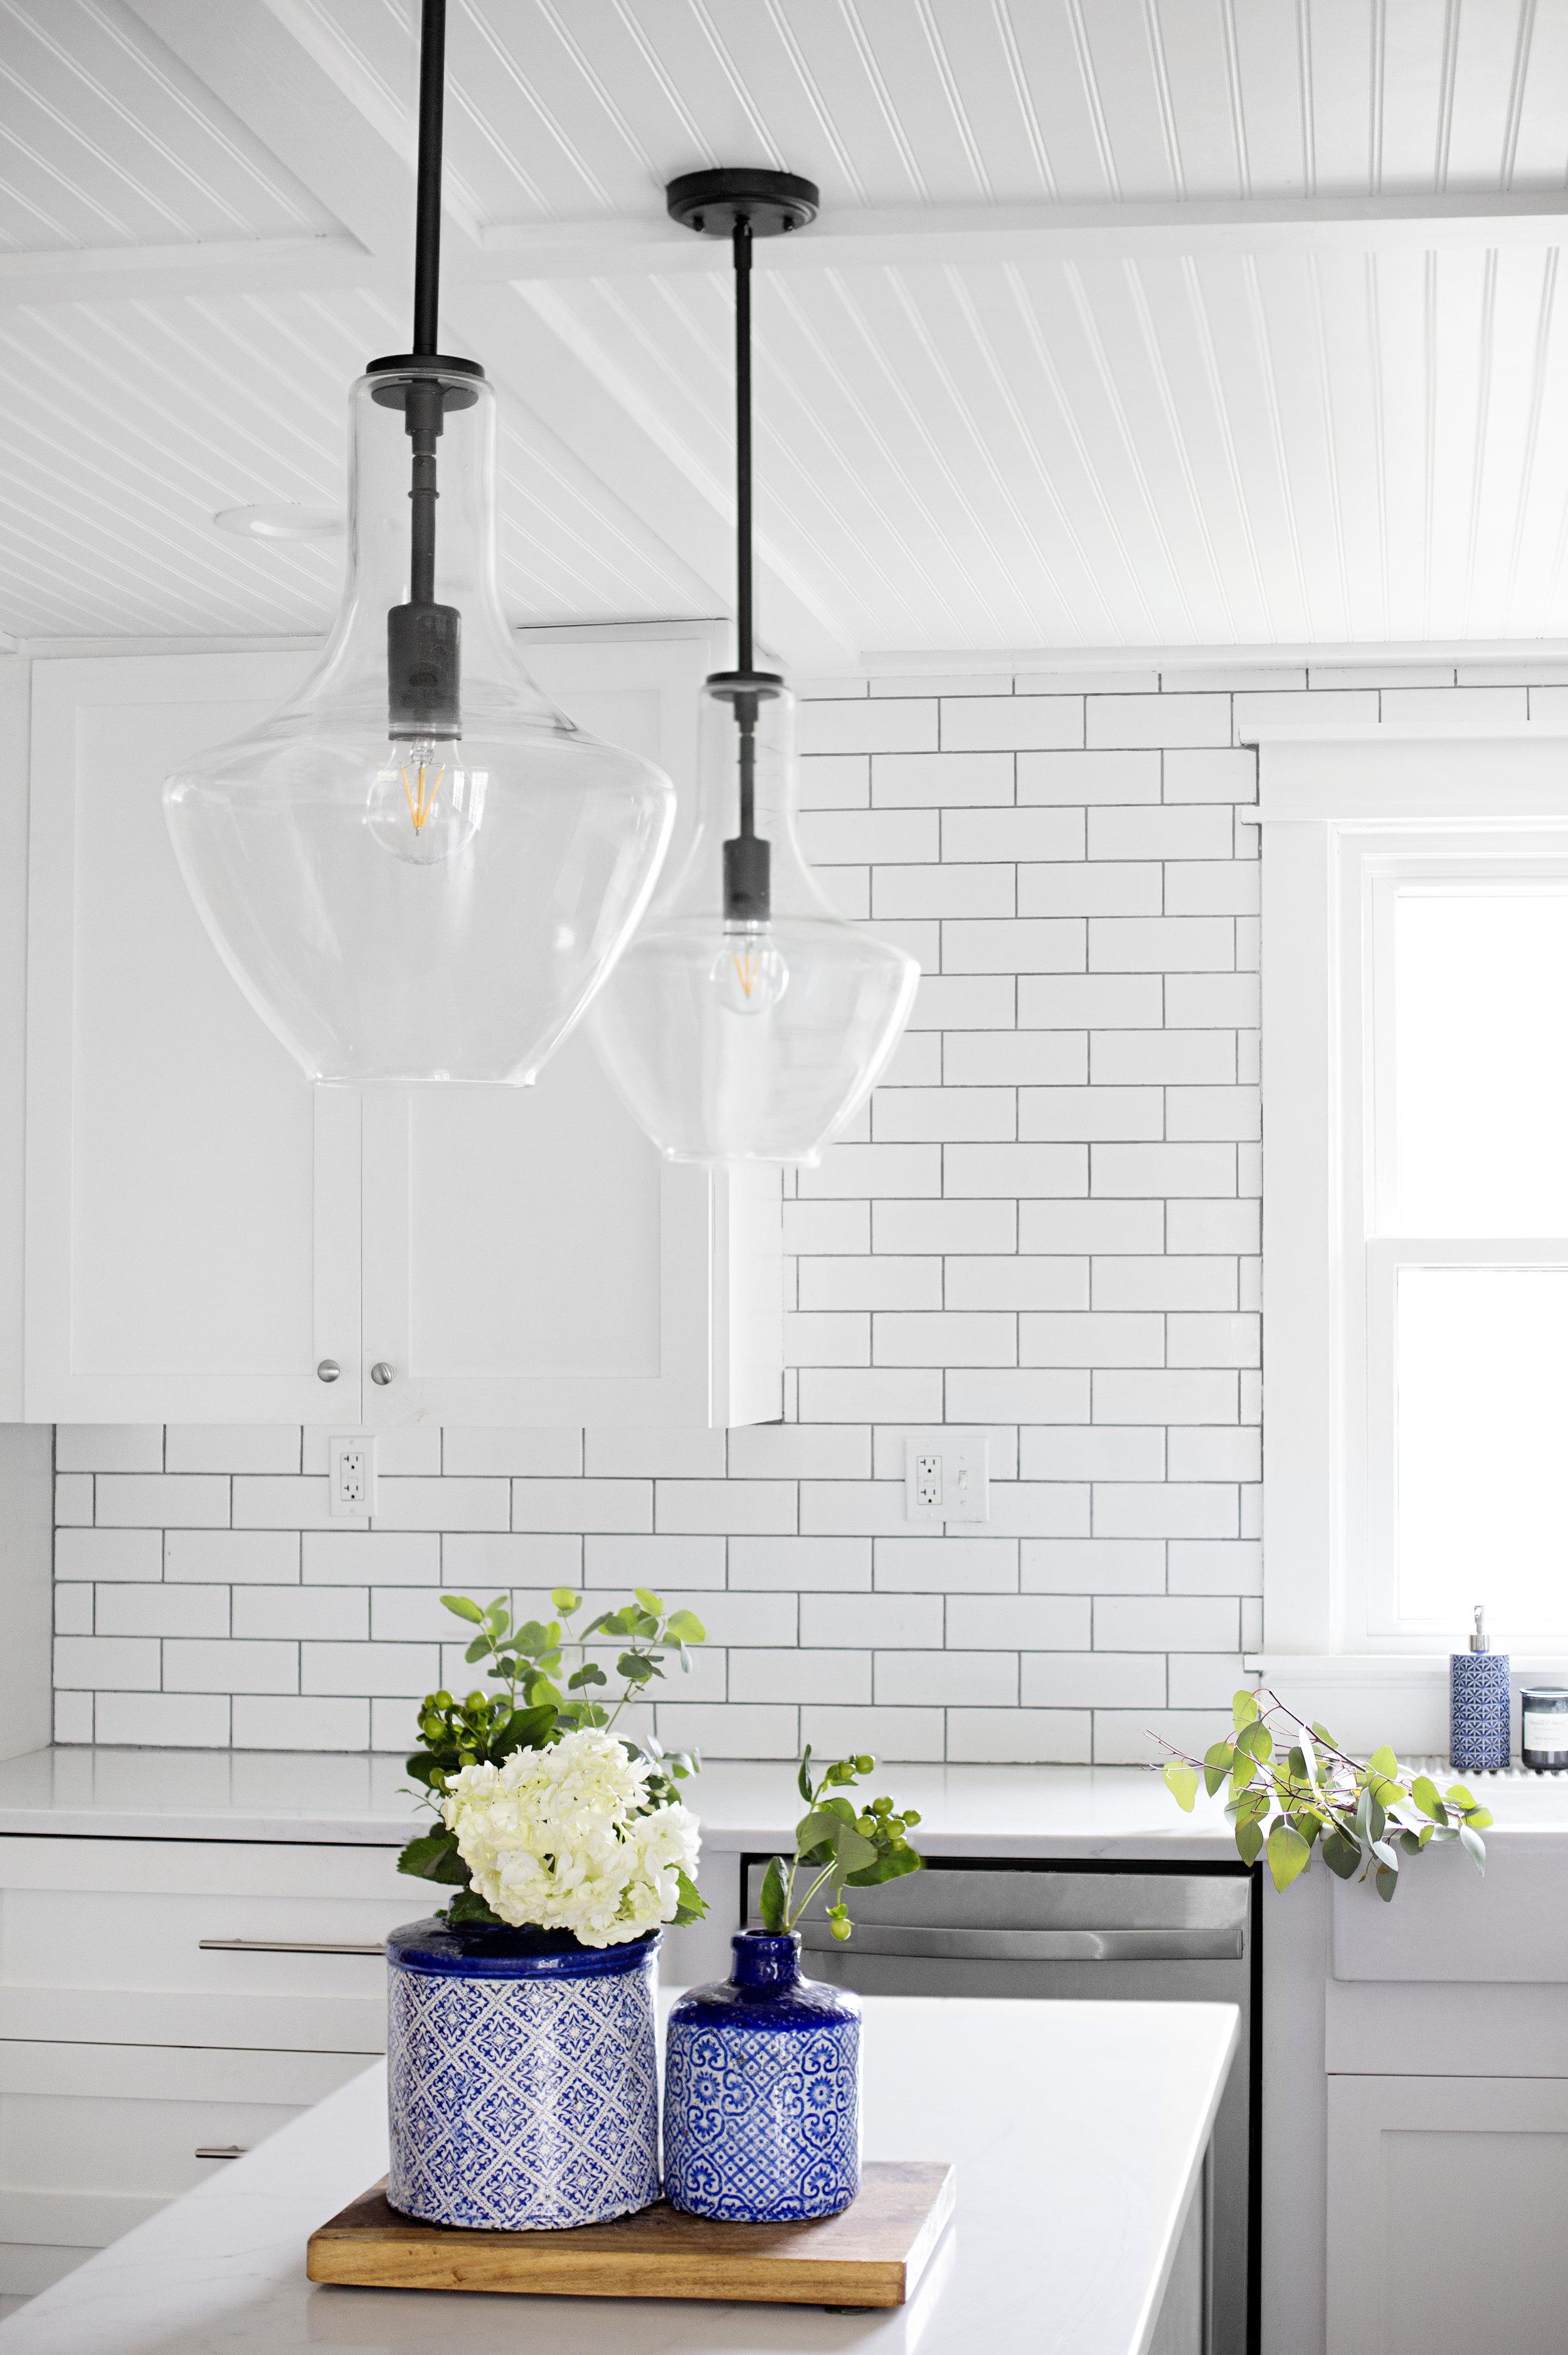 Ikea Semihandmade Kitchen from Peach and PIne Home